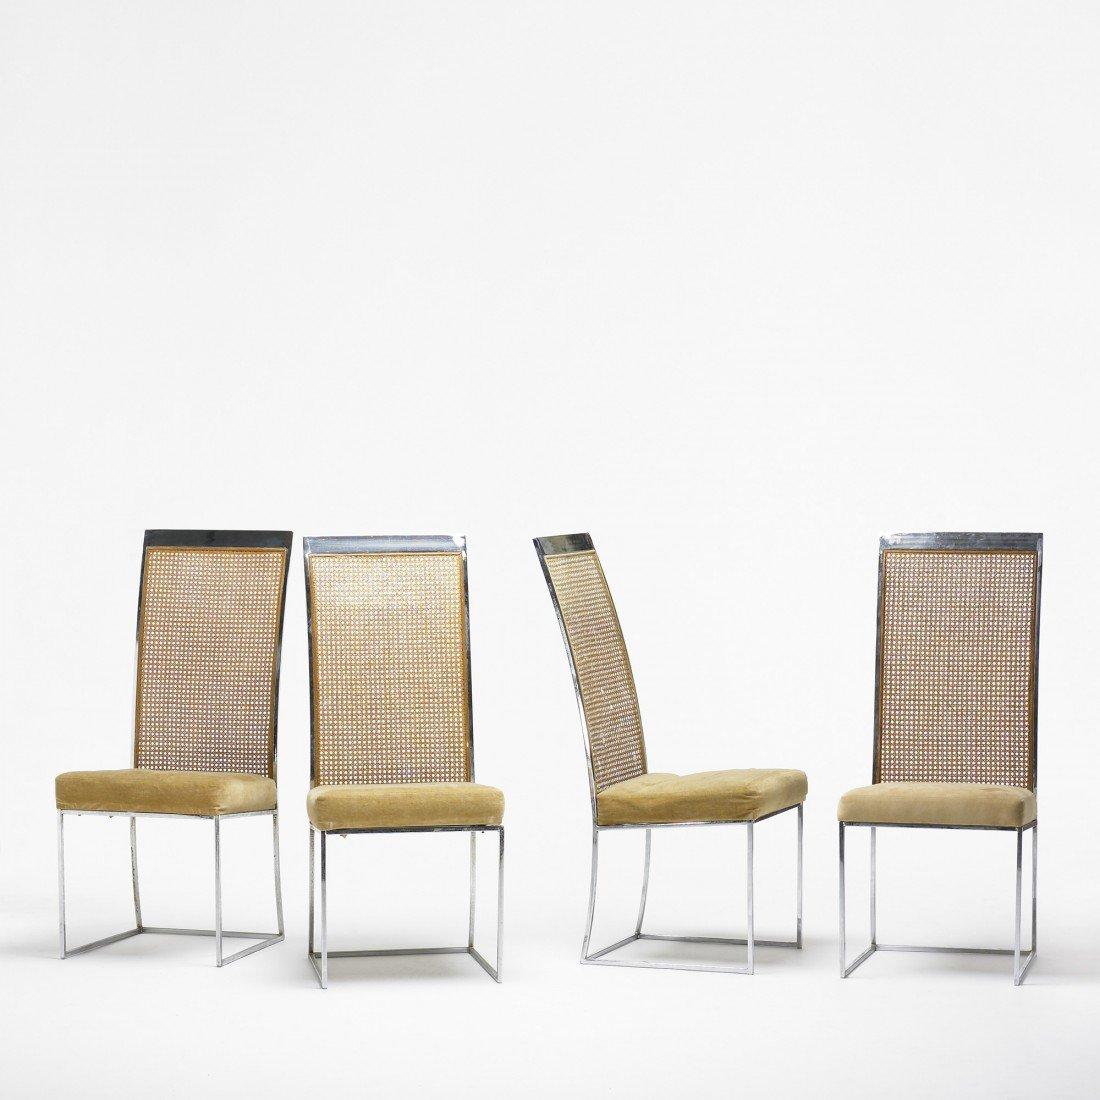 140: Milo Baughman chairs, set of four